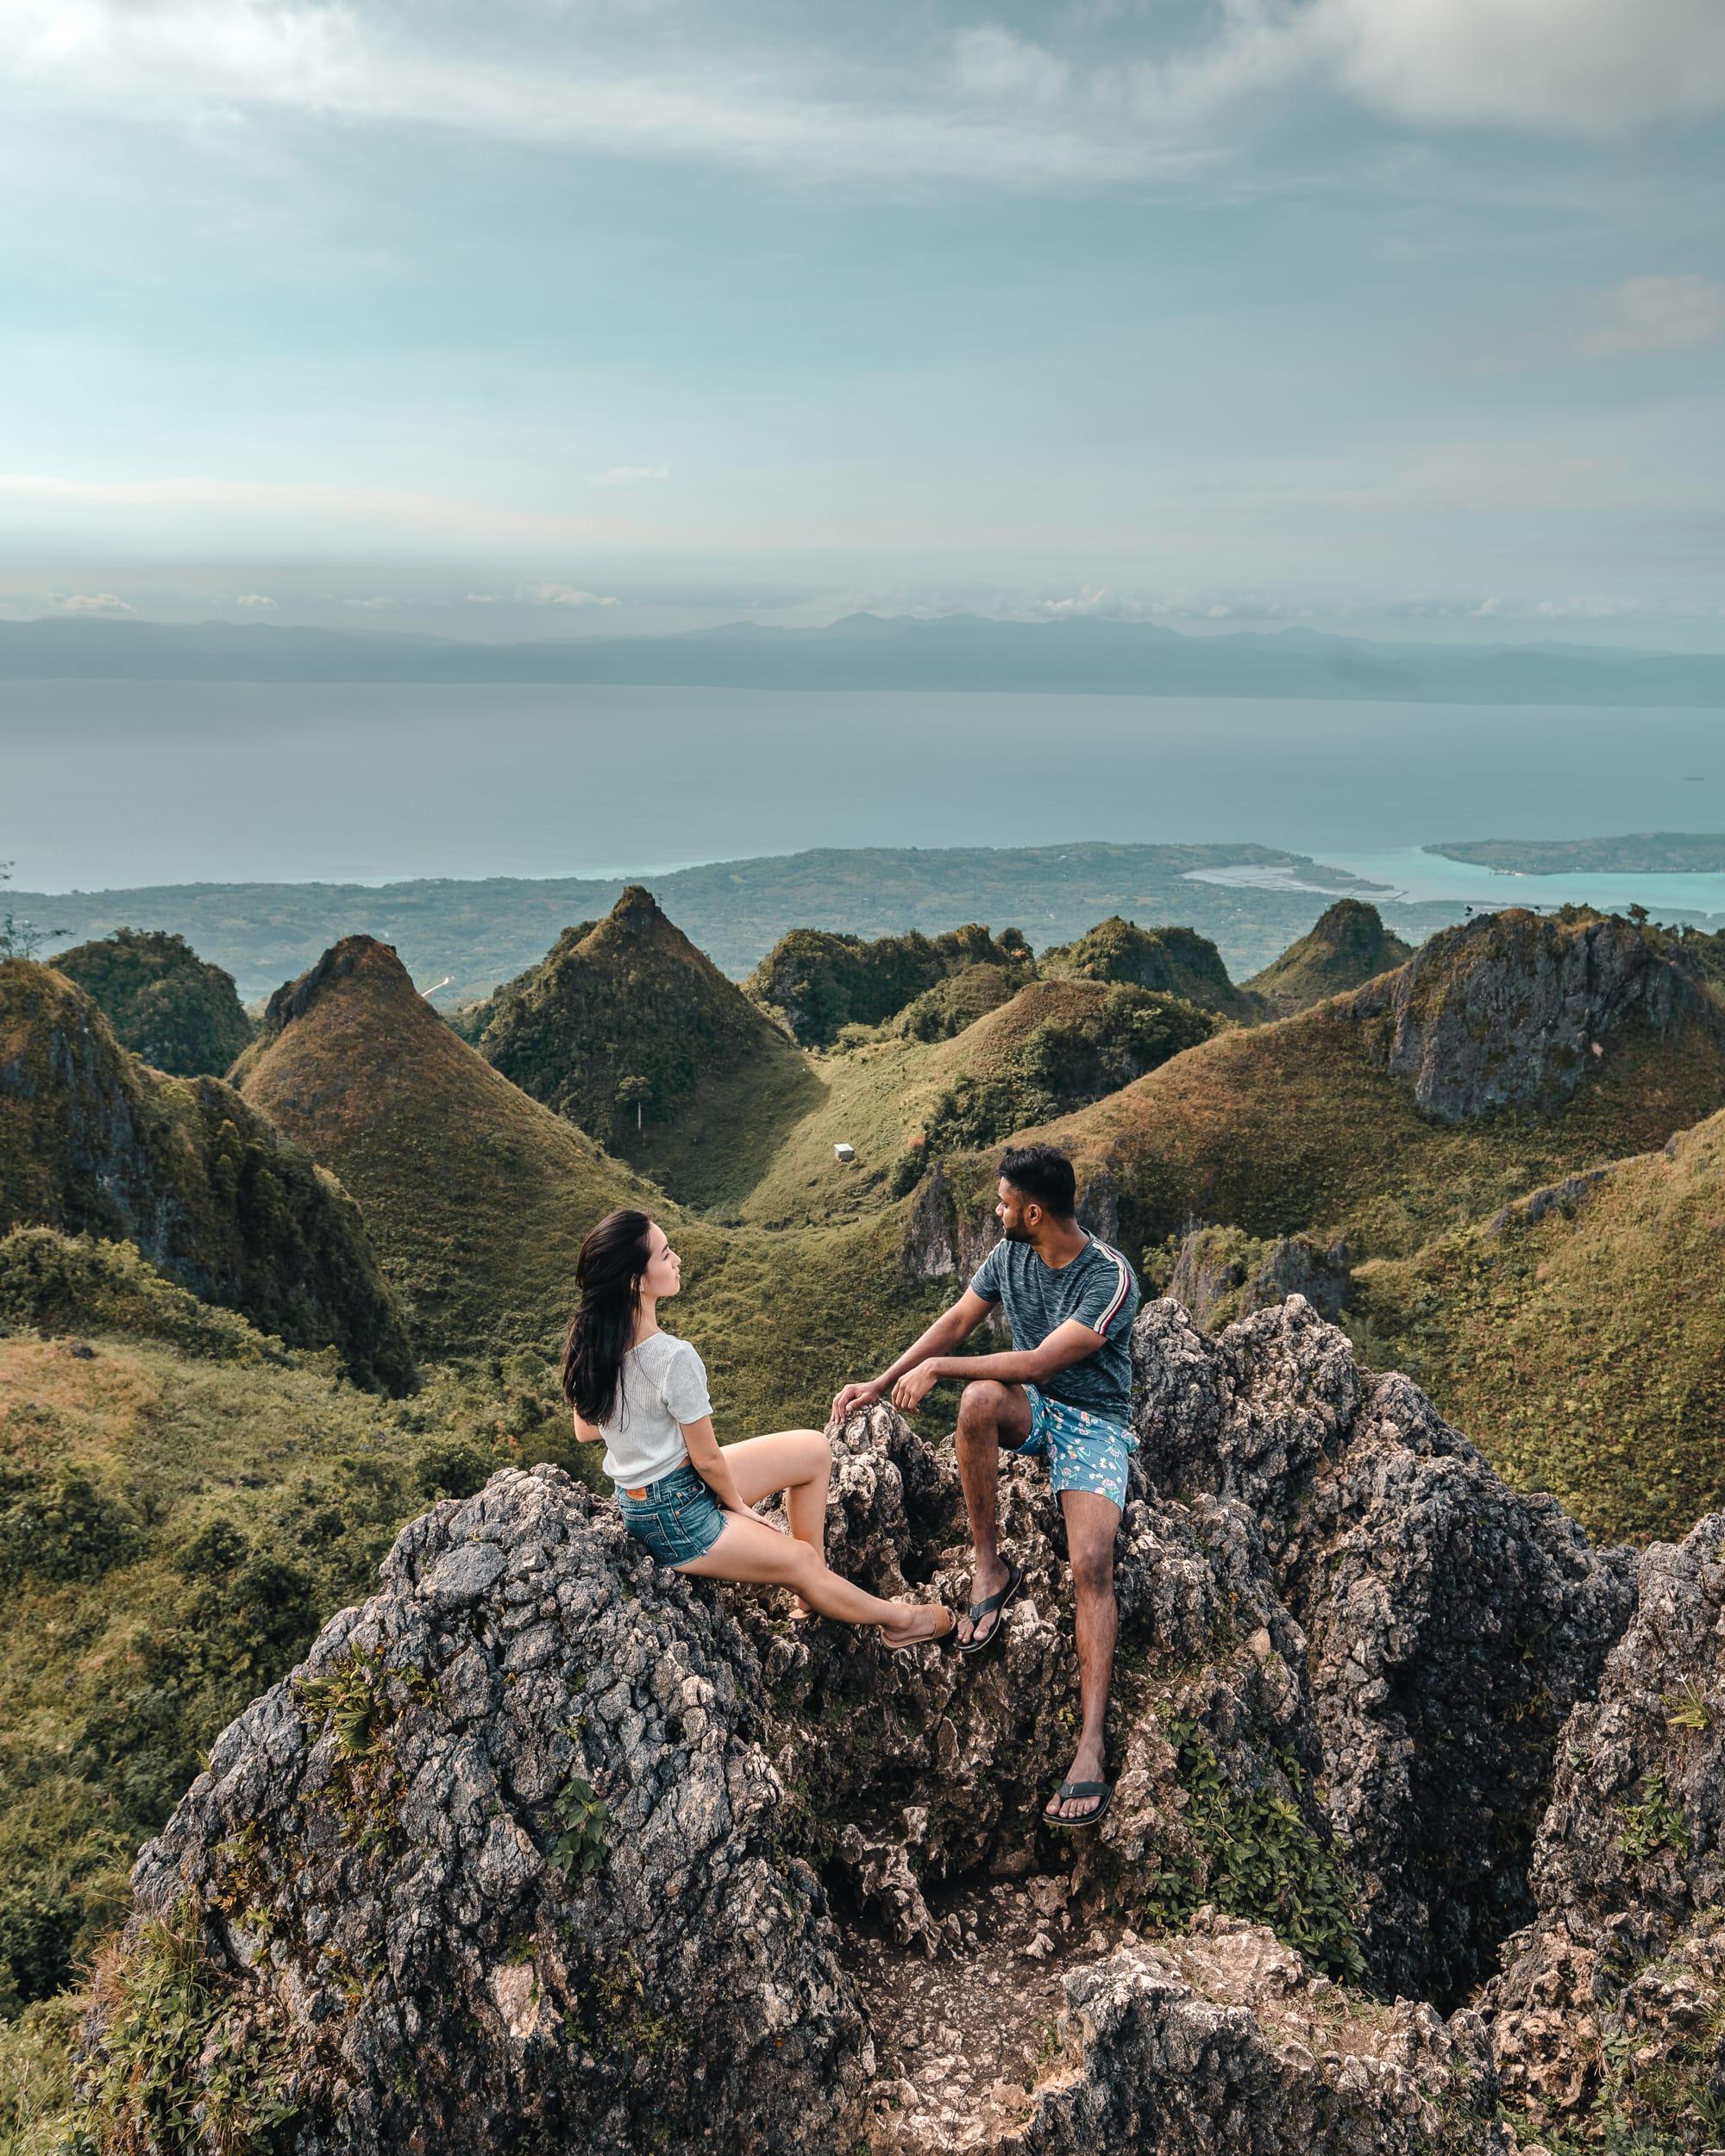 cebu-budget-guide-osmena-peak